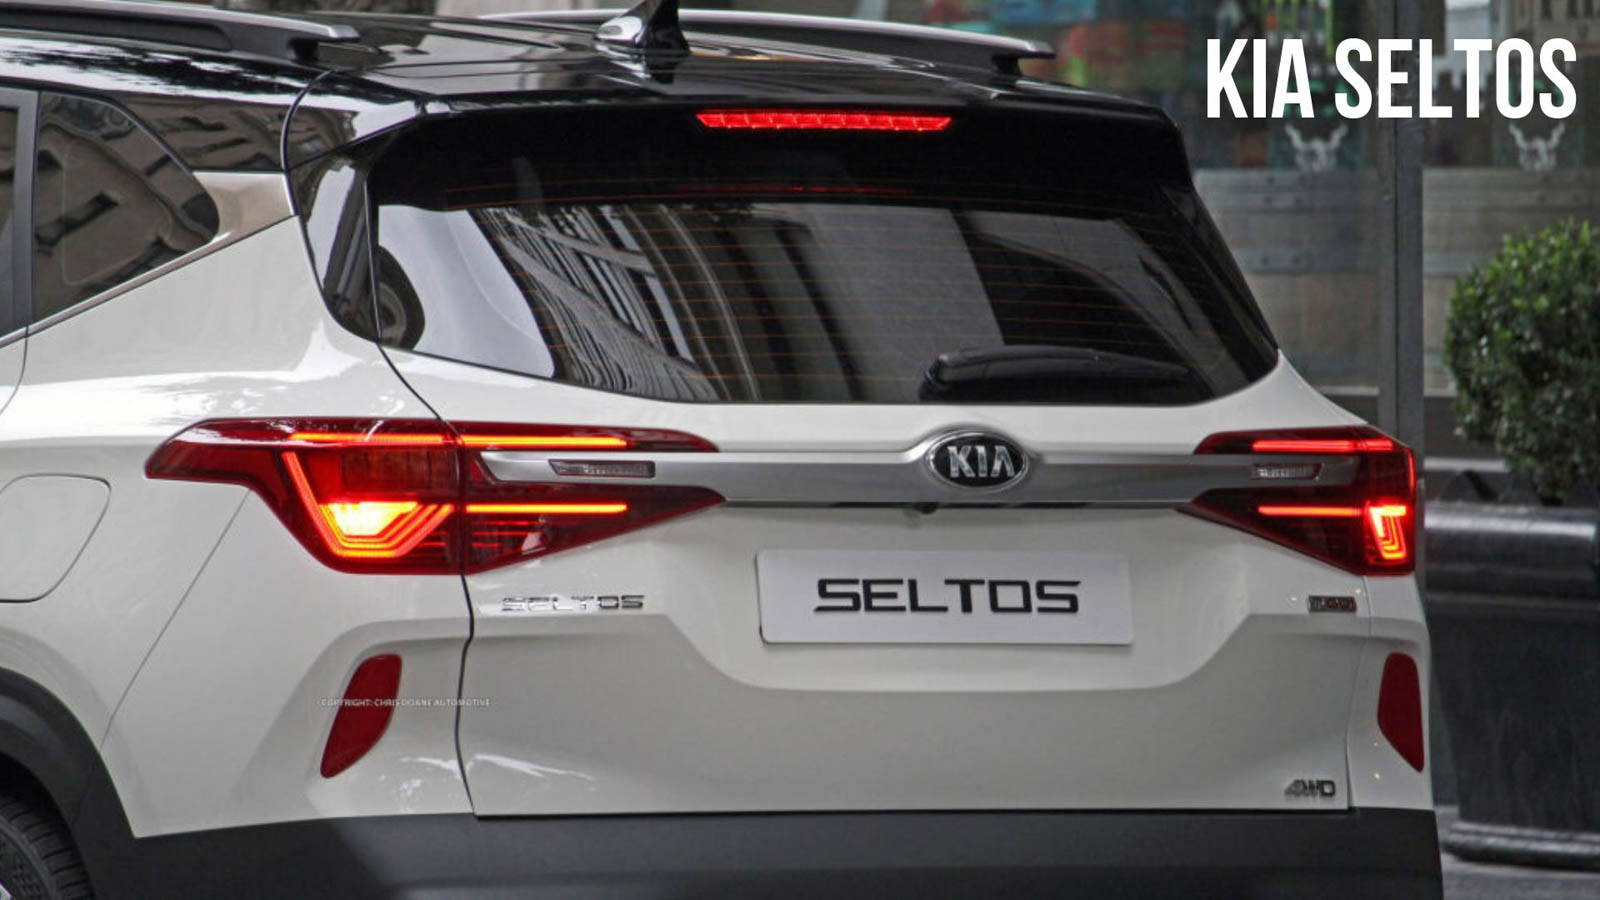 Kia Seltos Announced As Brand's New Global Compact SUV